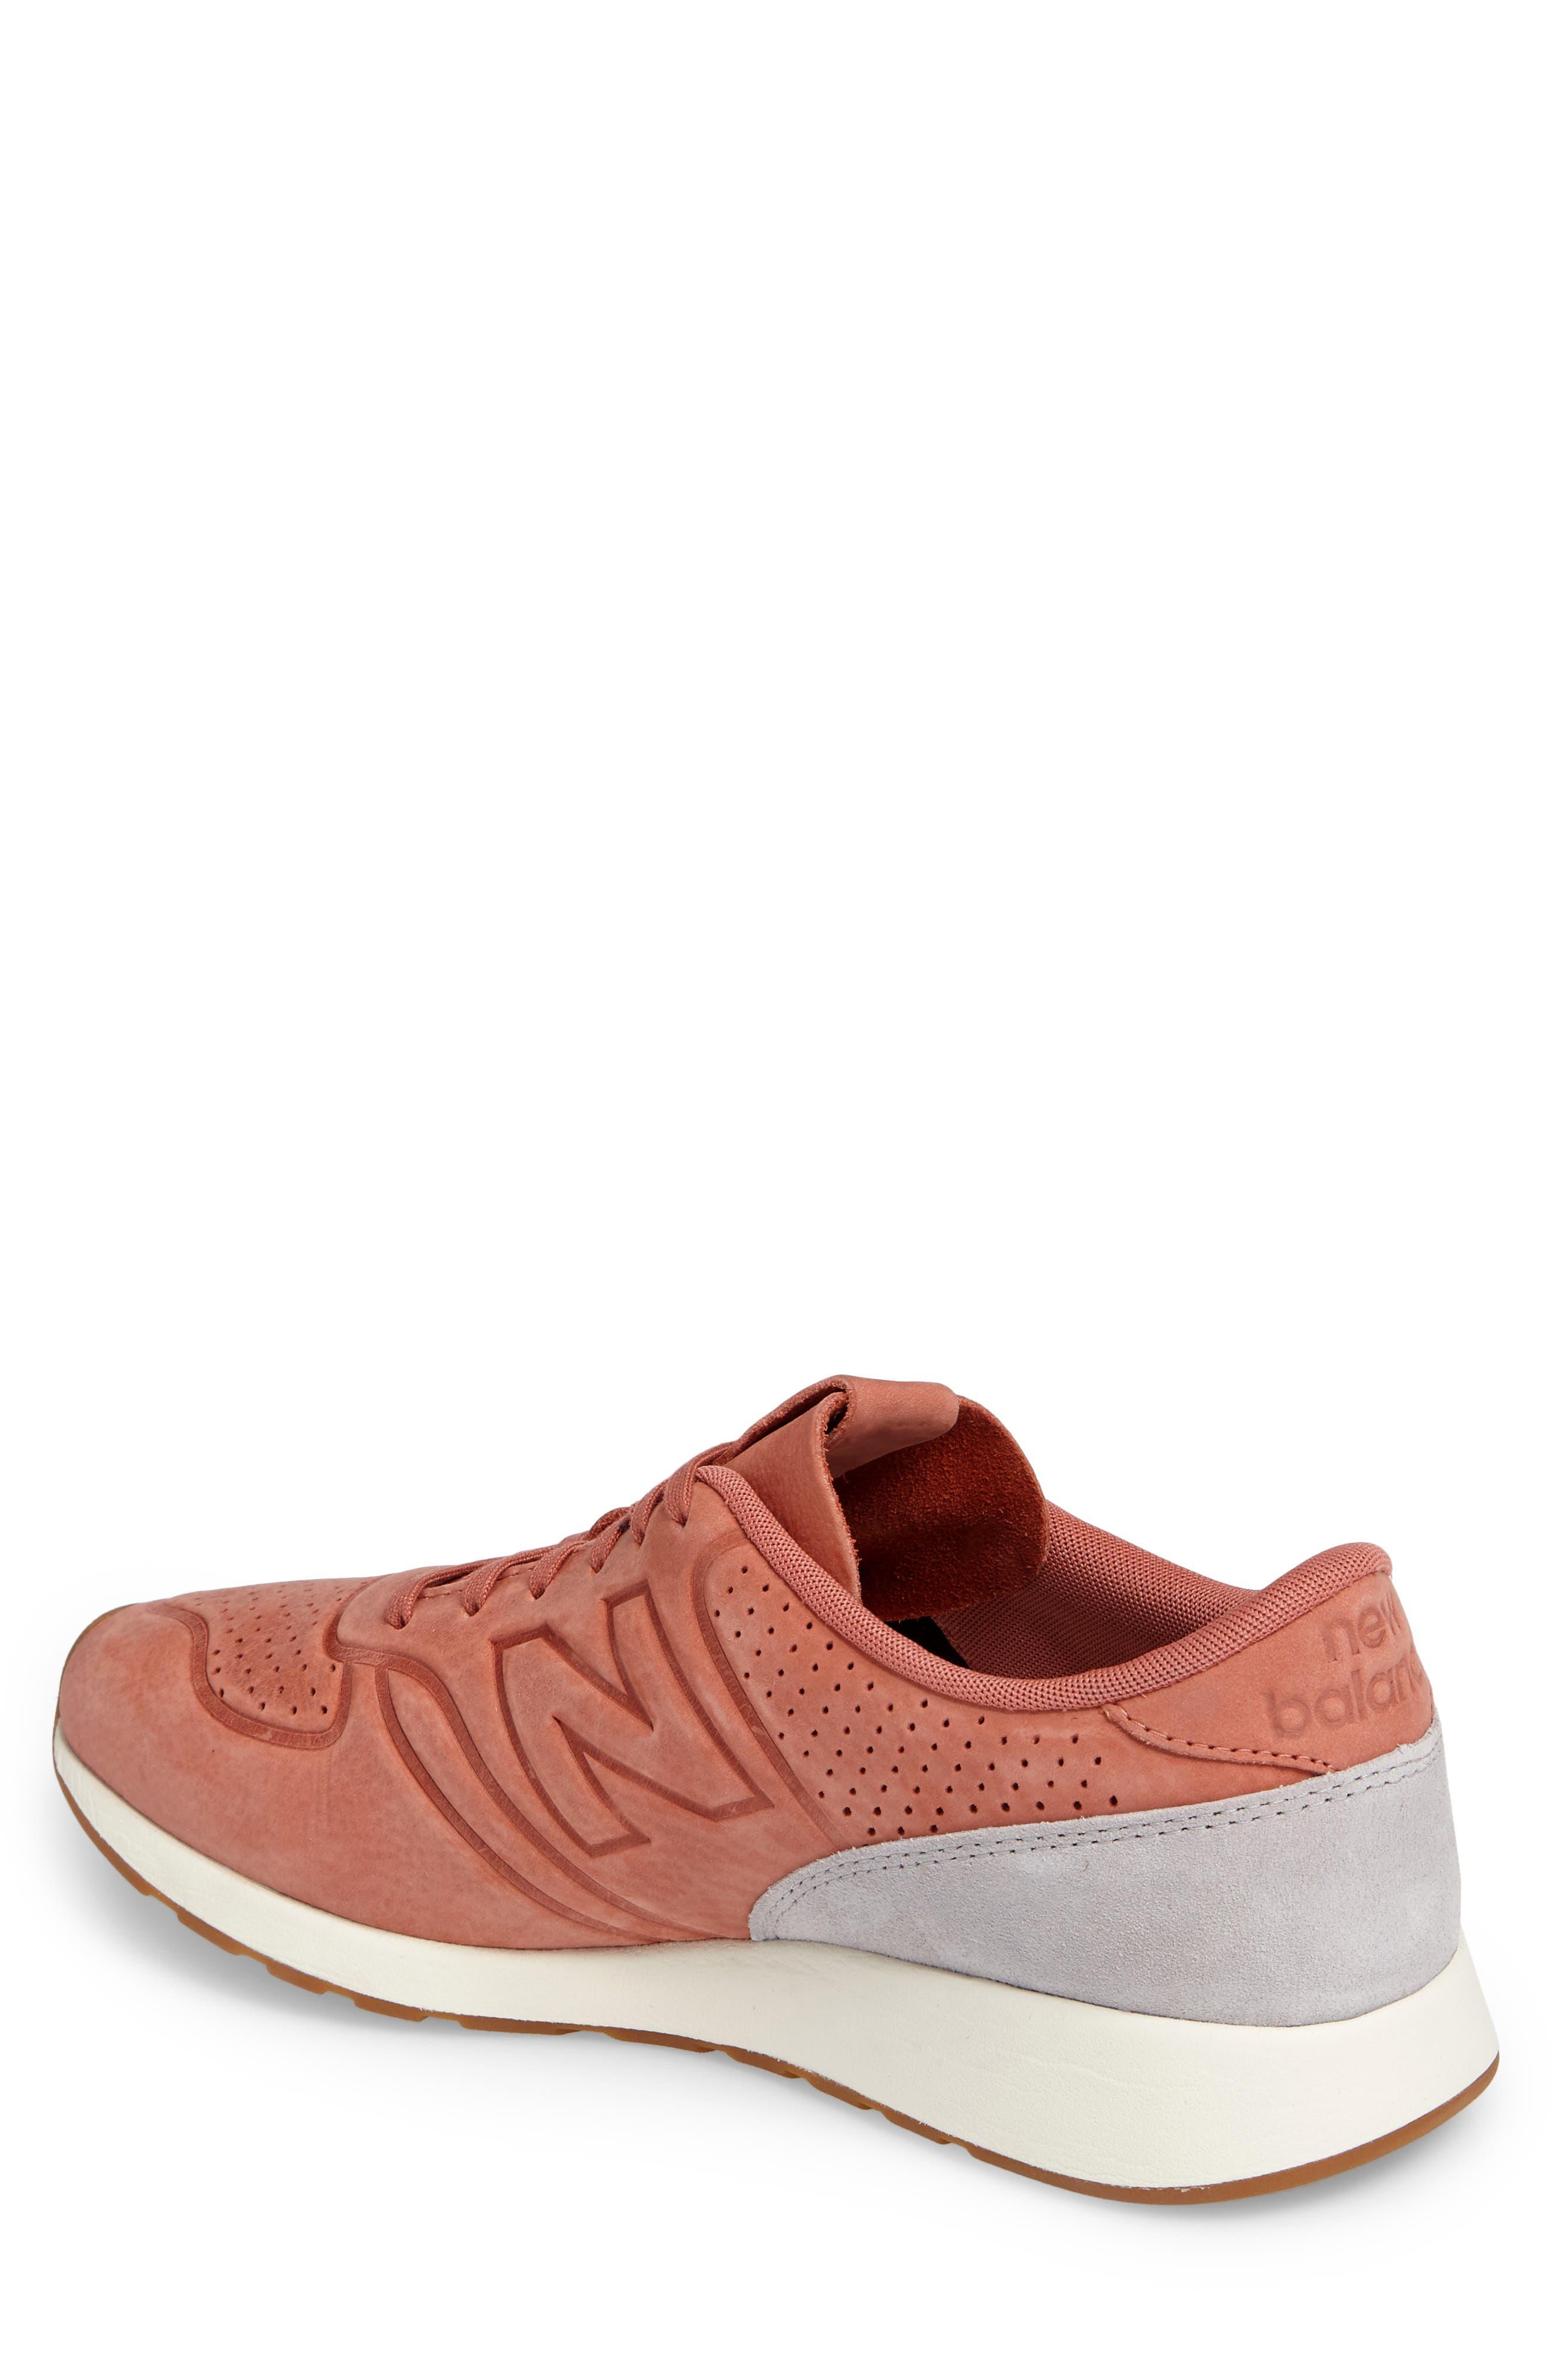 Alternate Image 2  - New Balance 420 Premium Decon Sneaker (Men)